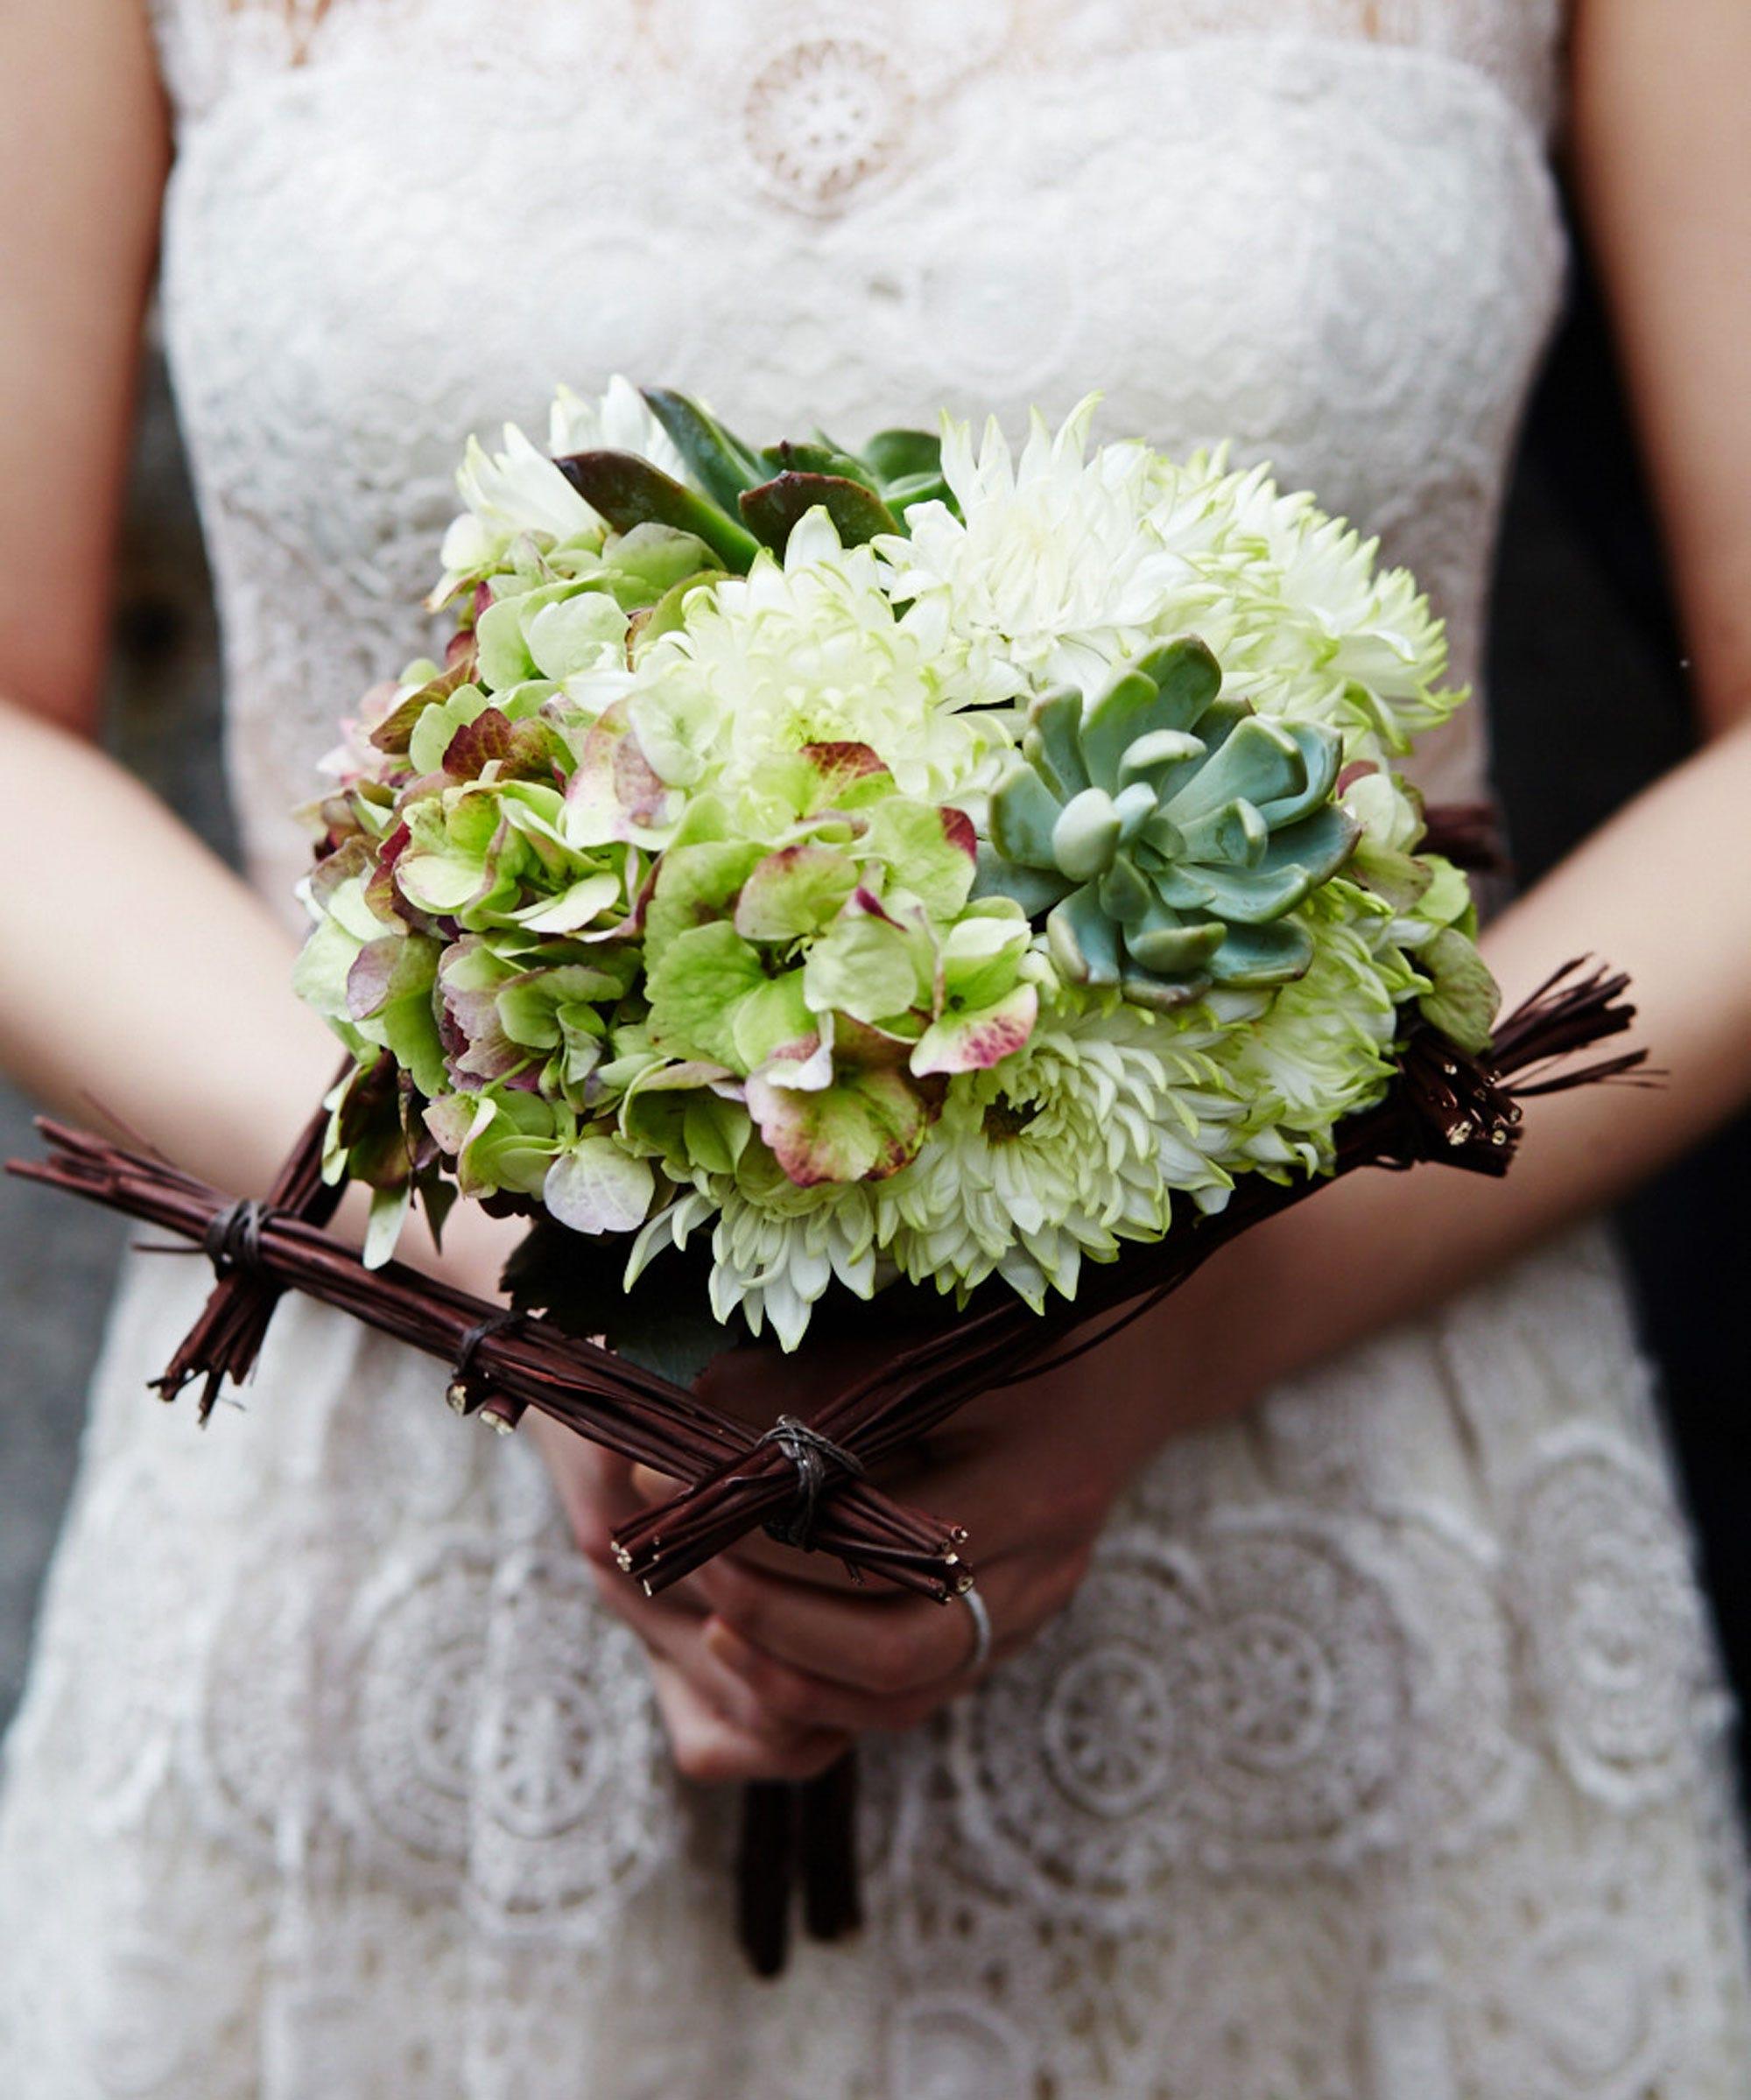 How To Make Wedding Budget 16000 Dollars In Nashville